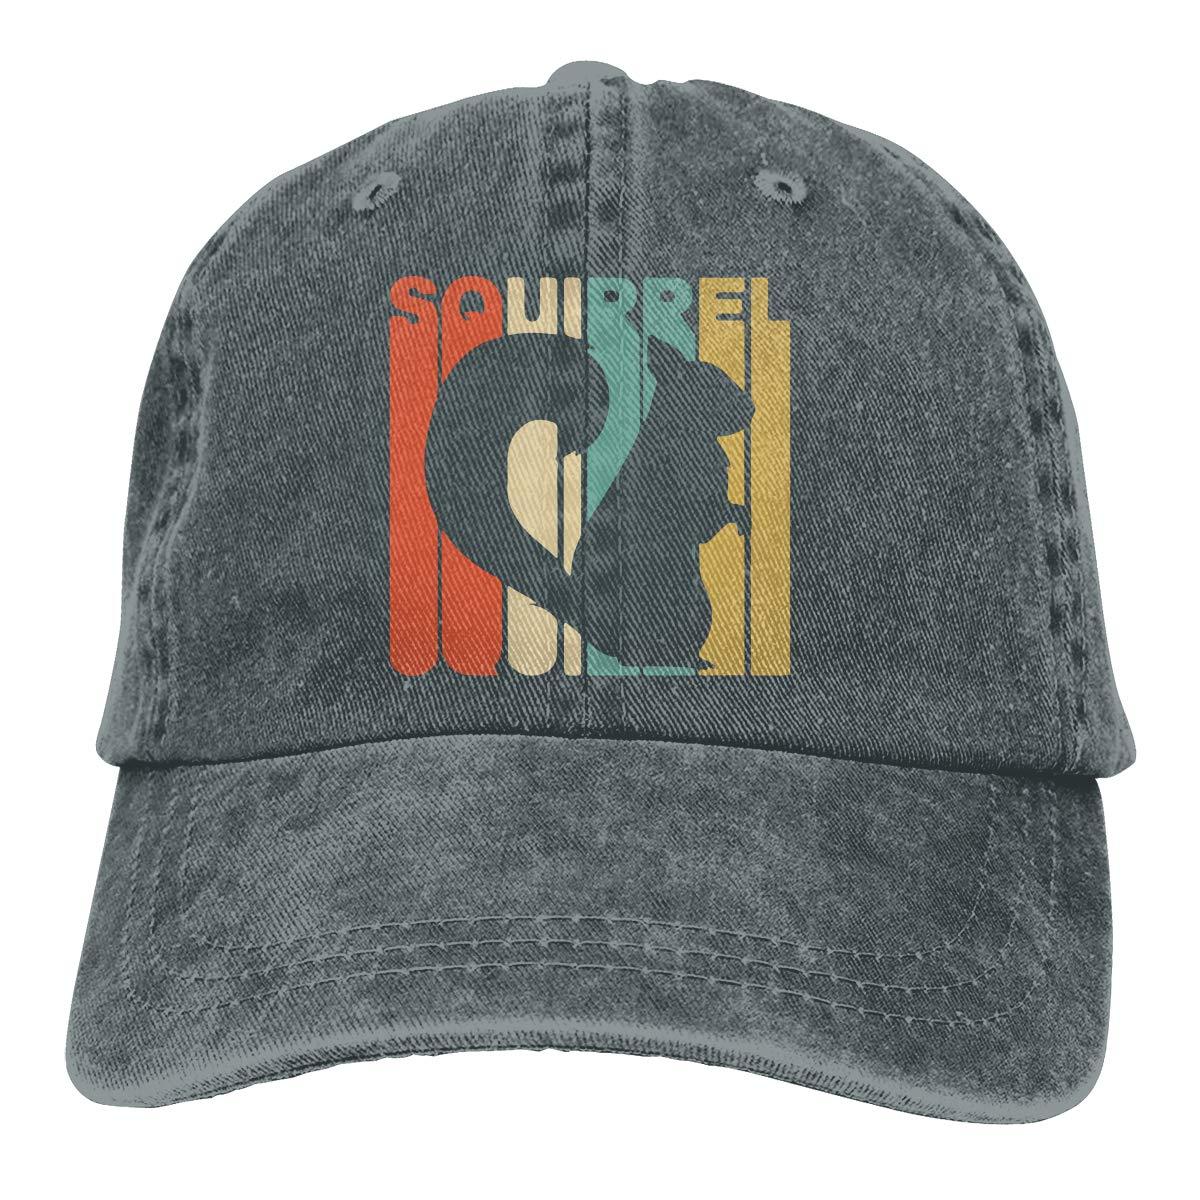 Vintage Style Squirrel Unisex Personalize Cowboy Sun Hat Adjustable Baseball Cap